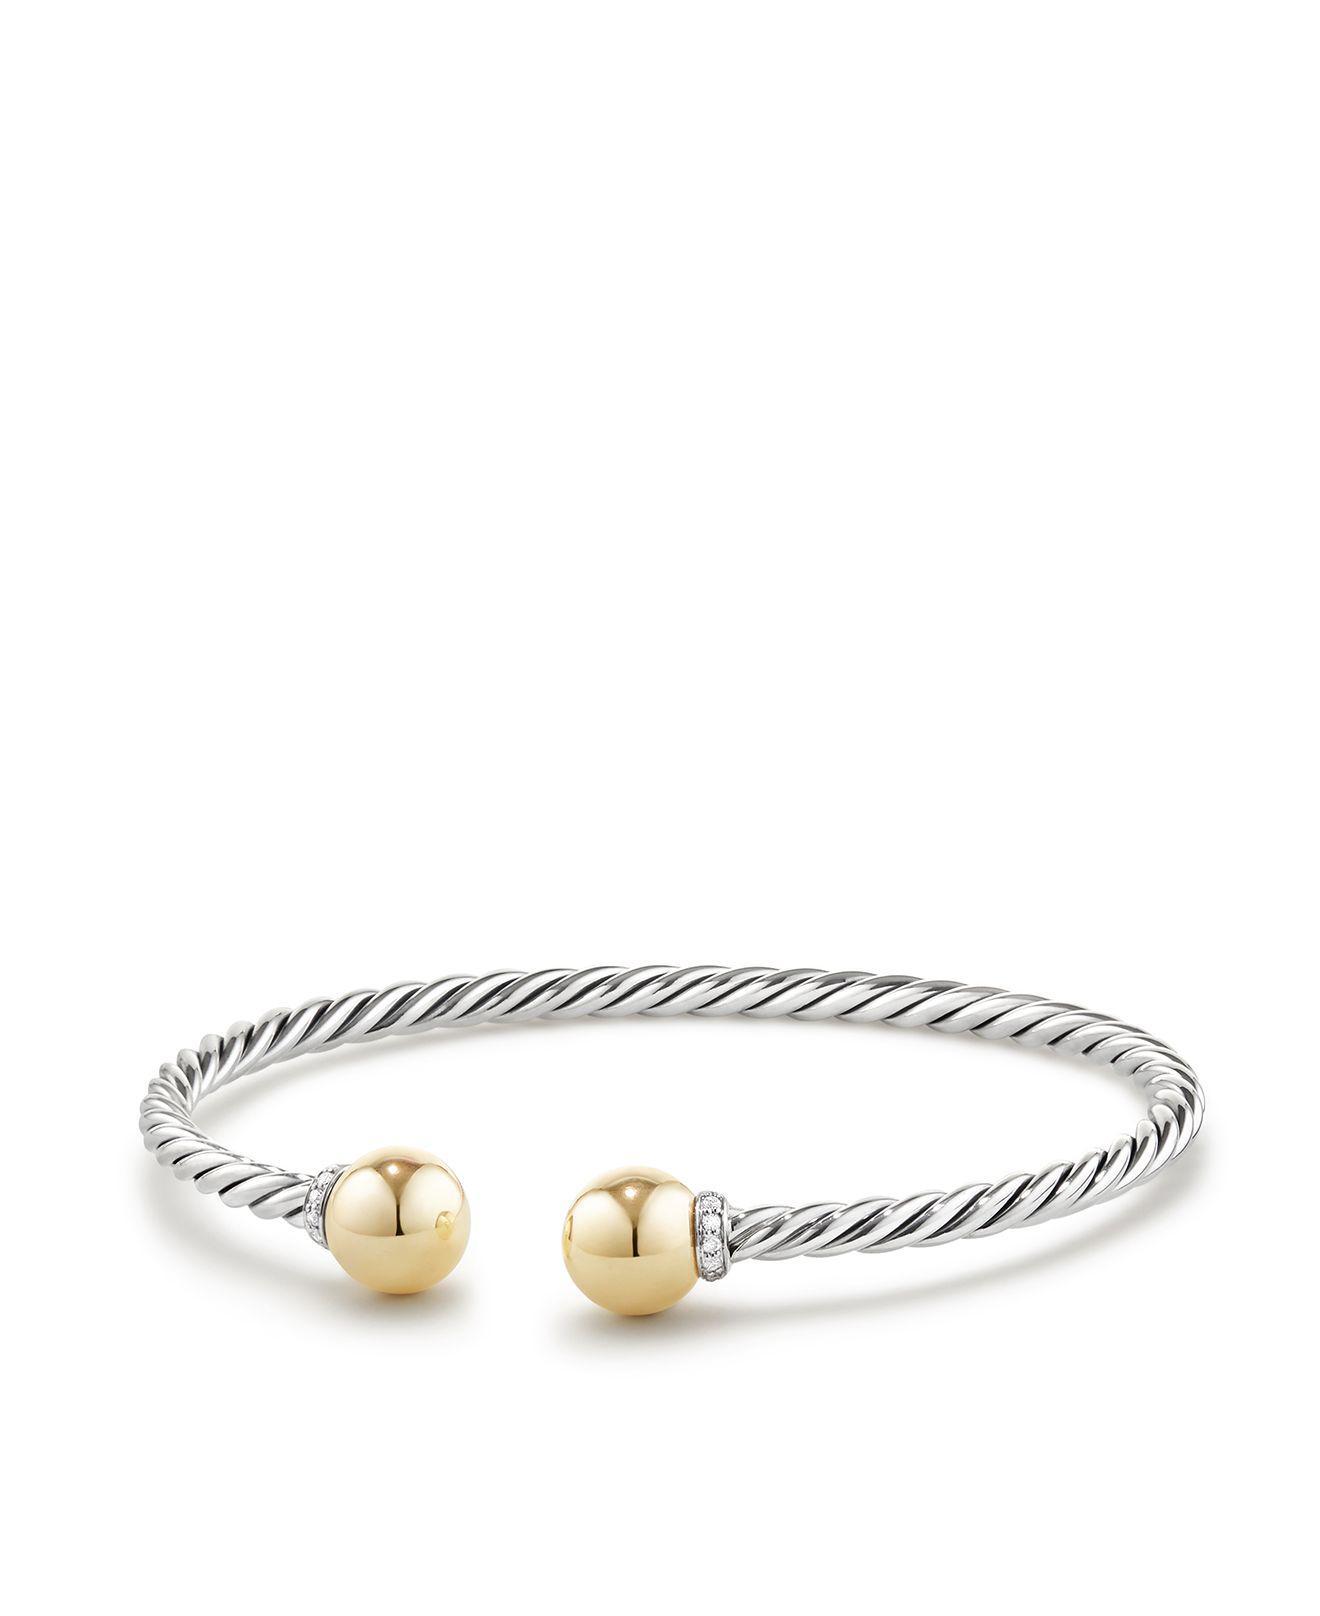 18kt yellow gold Solari cuff bracelet - Metallic David Yurman TzTDR7vee